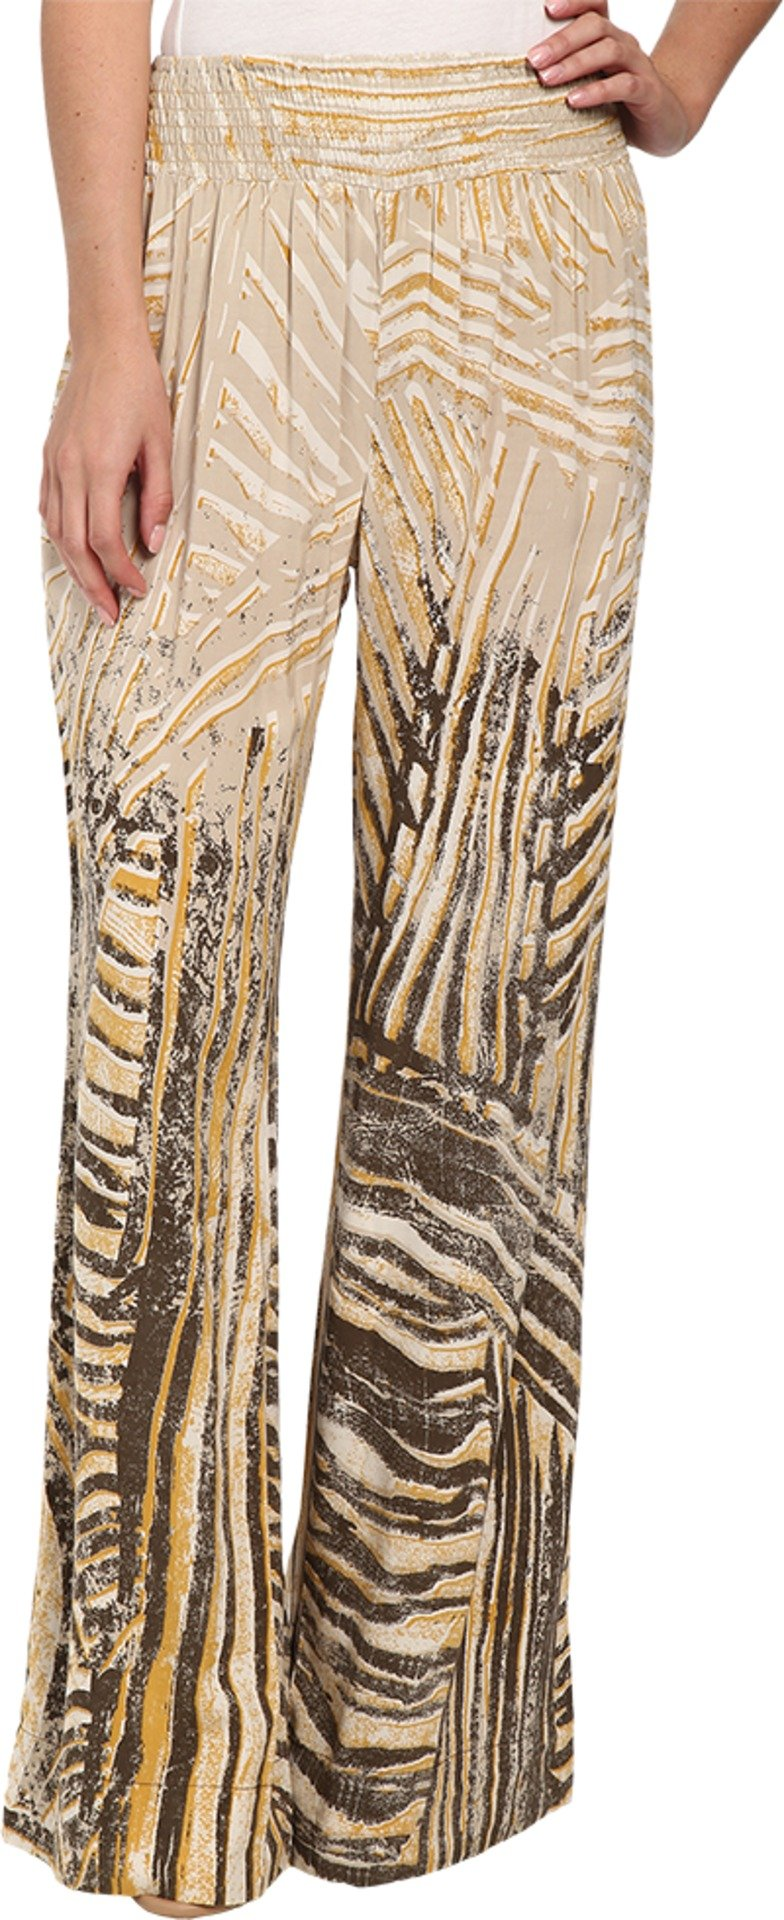 NIC+ZOE Women's Summer Shadows Pants Multi Pants SM (US 4-6) X 32